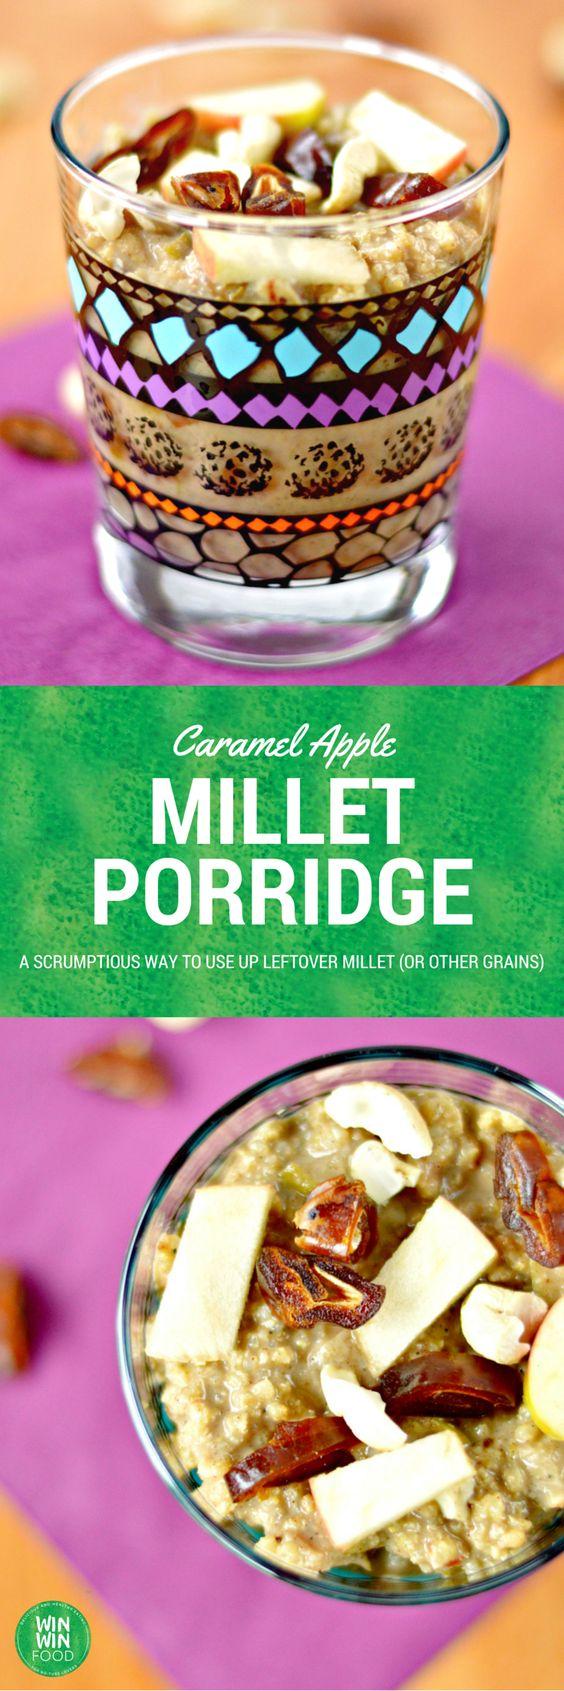 Caramel Apple Millet Porridge | WIN-WINFOOD.com #vegan #glutenfree #cleaneating #plantbased #healthy